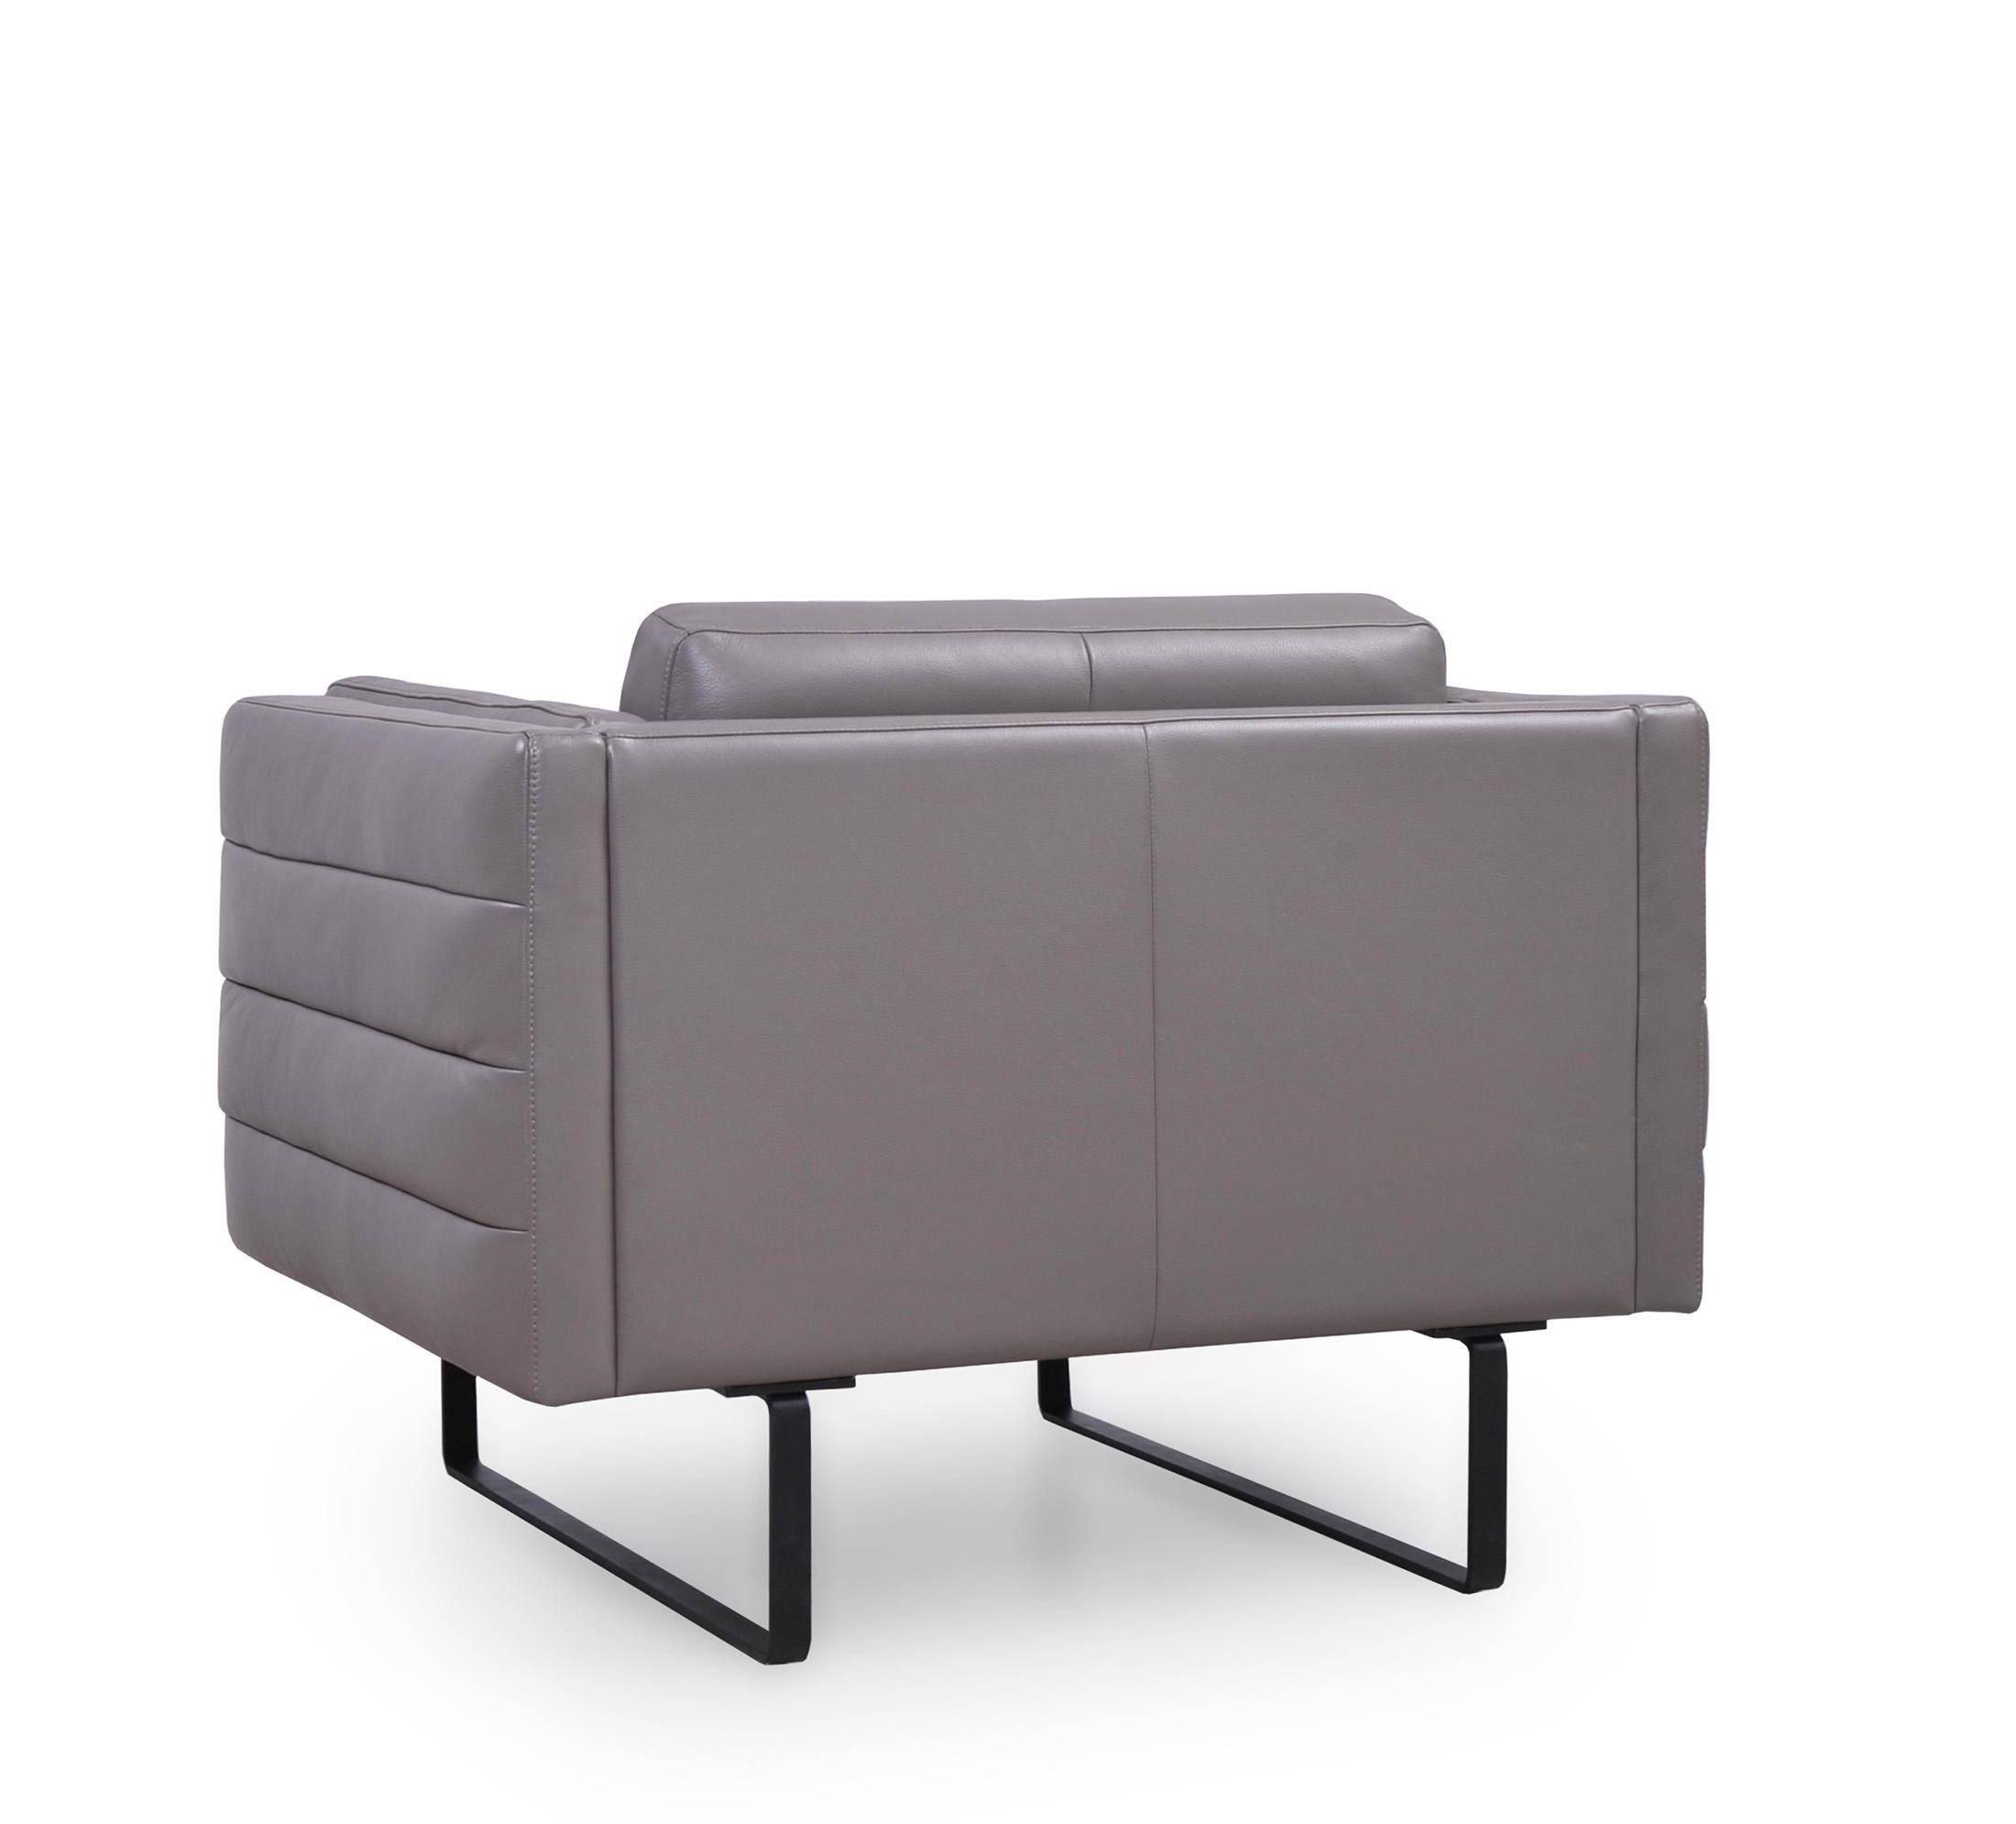 Orsen Tv Stands Regarding Famous Buy Moroni Orson 582 Sofa Armchair Set 2 Pcs In Gray, Top (View 1 of 25)